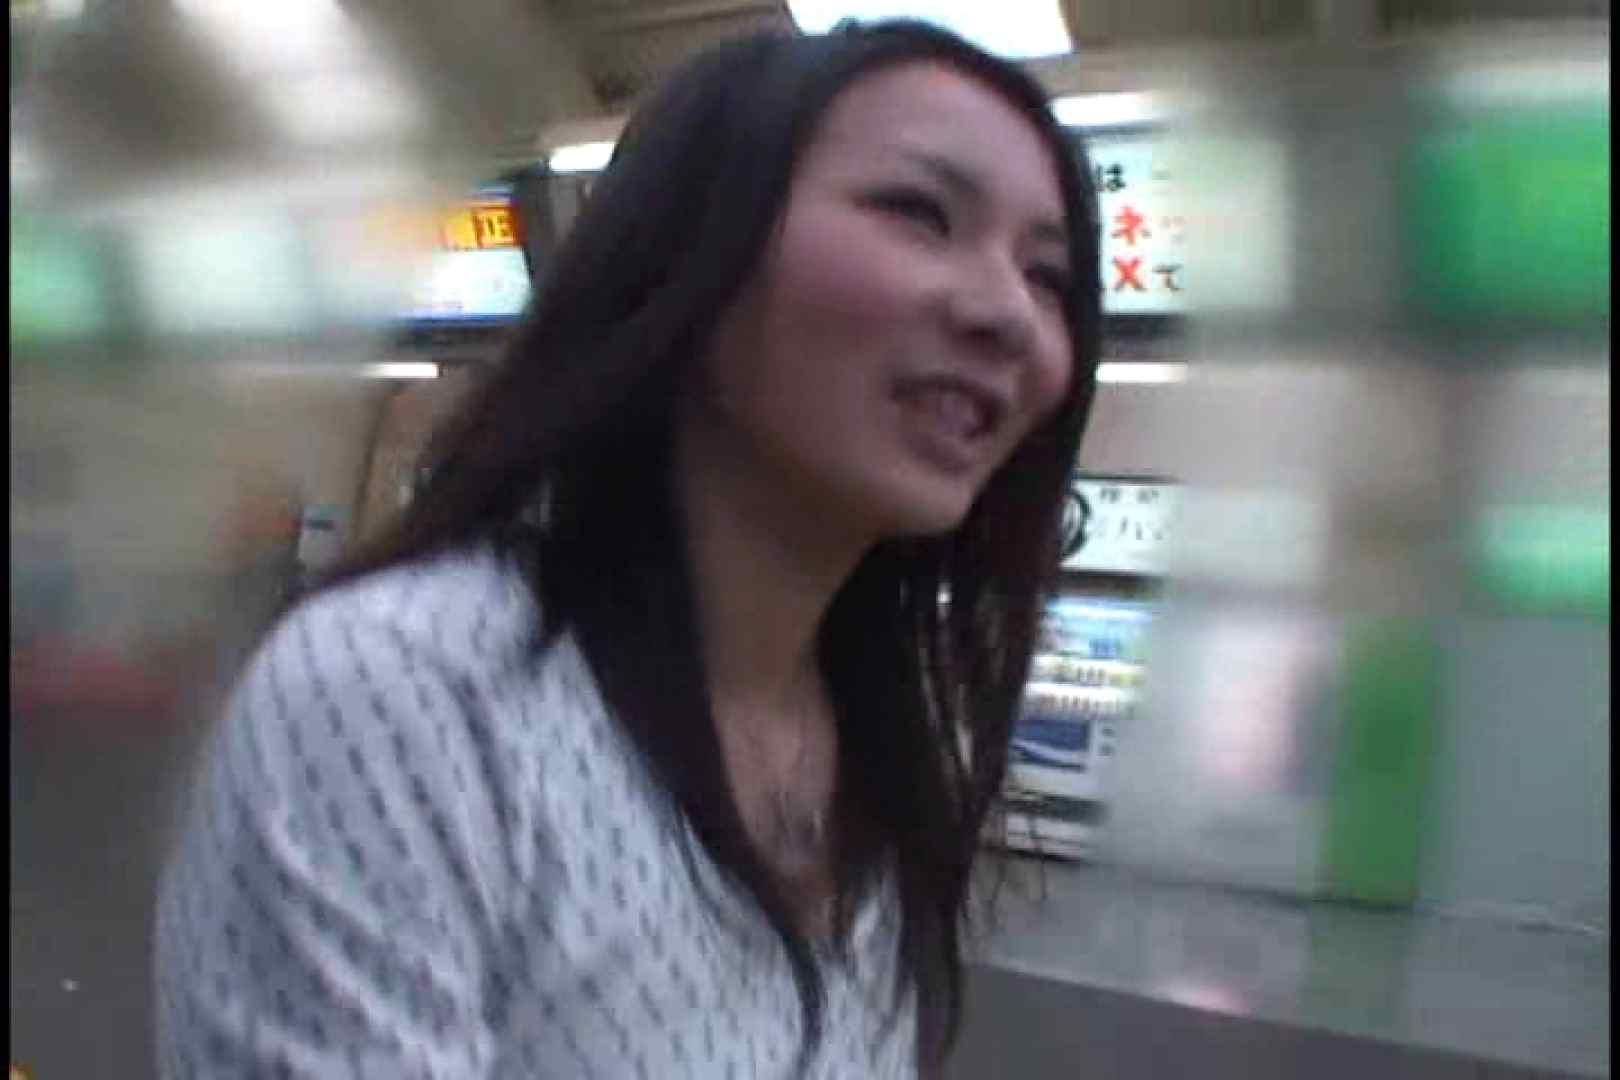 JDハンター全国ツアー vol.045 前編 女子大生丸裸  84pic 4